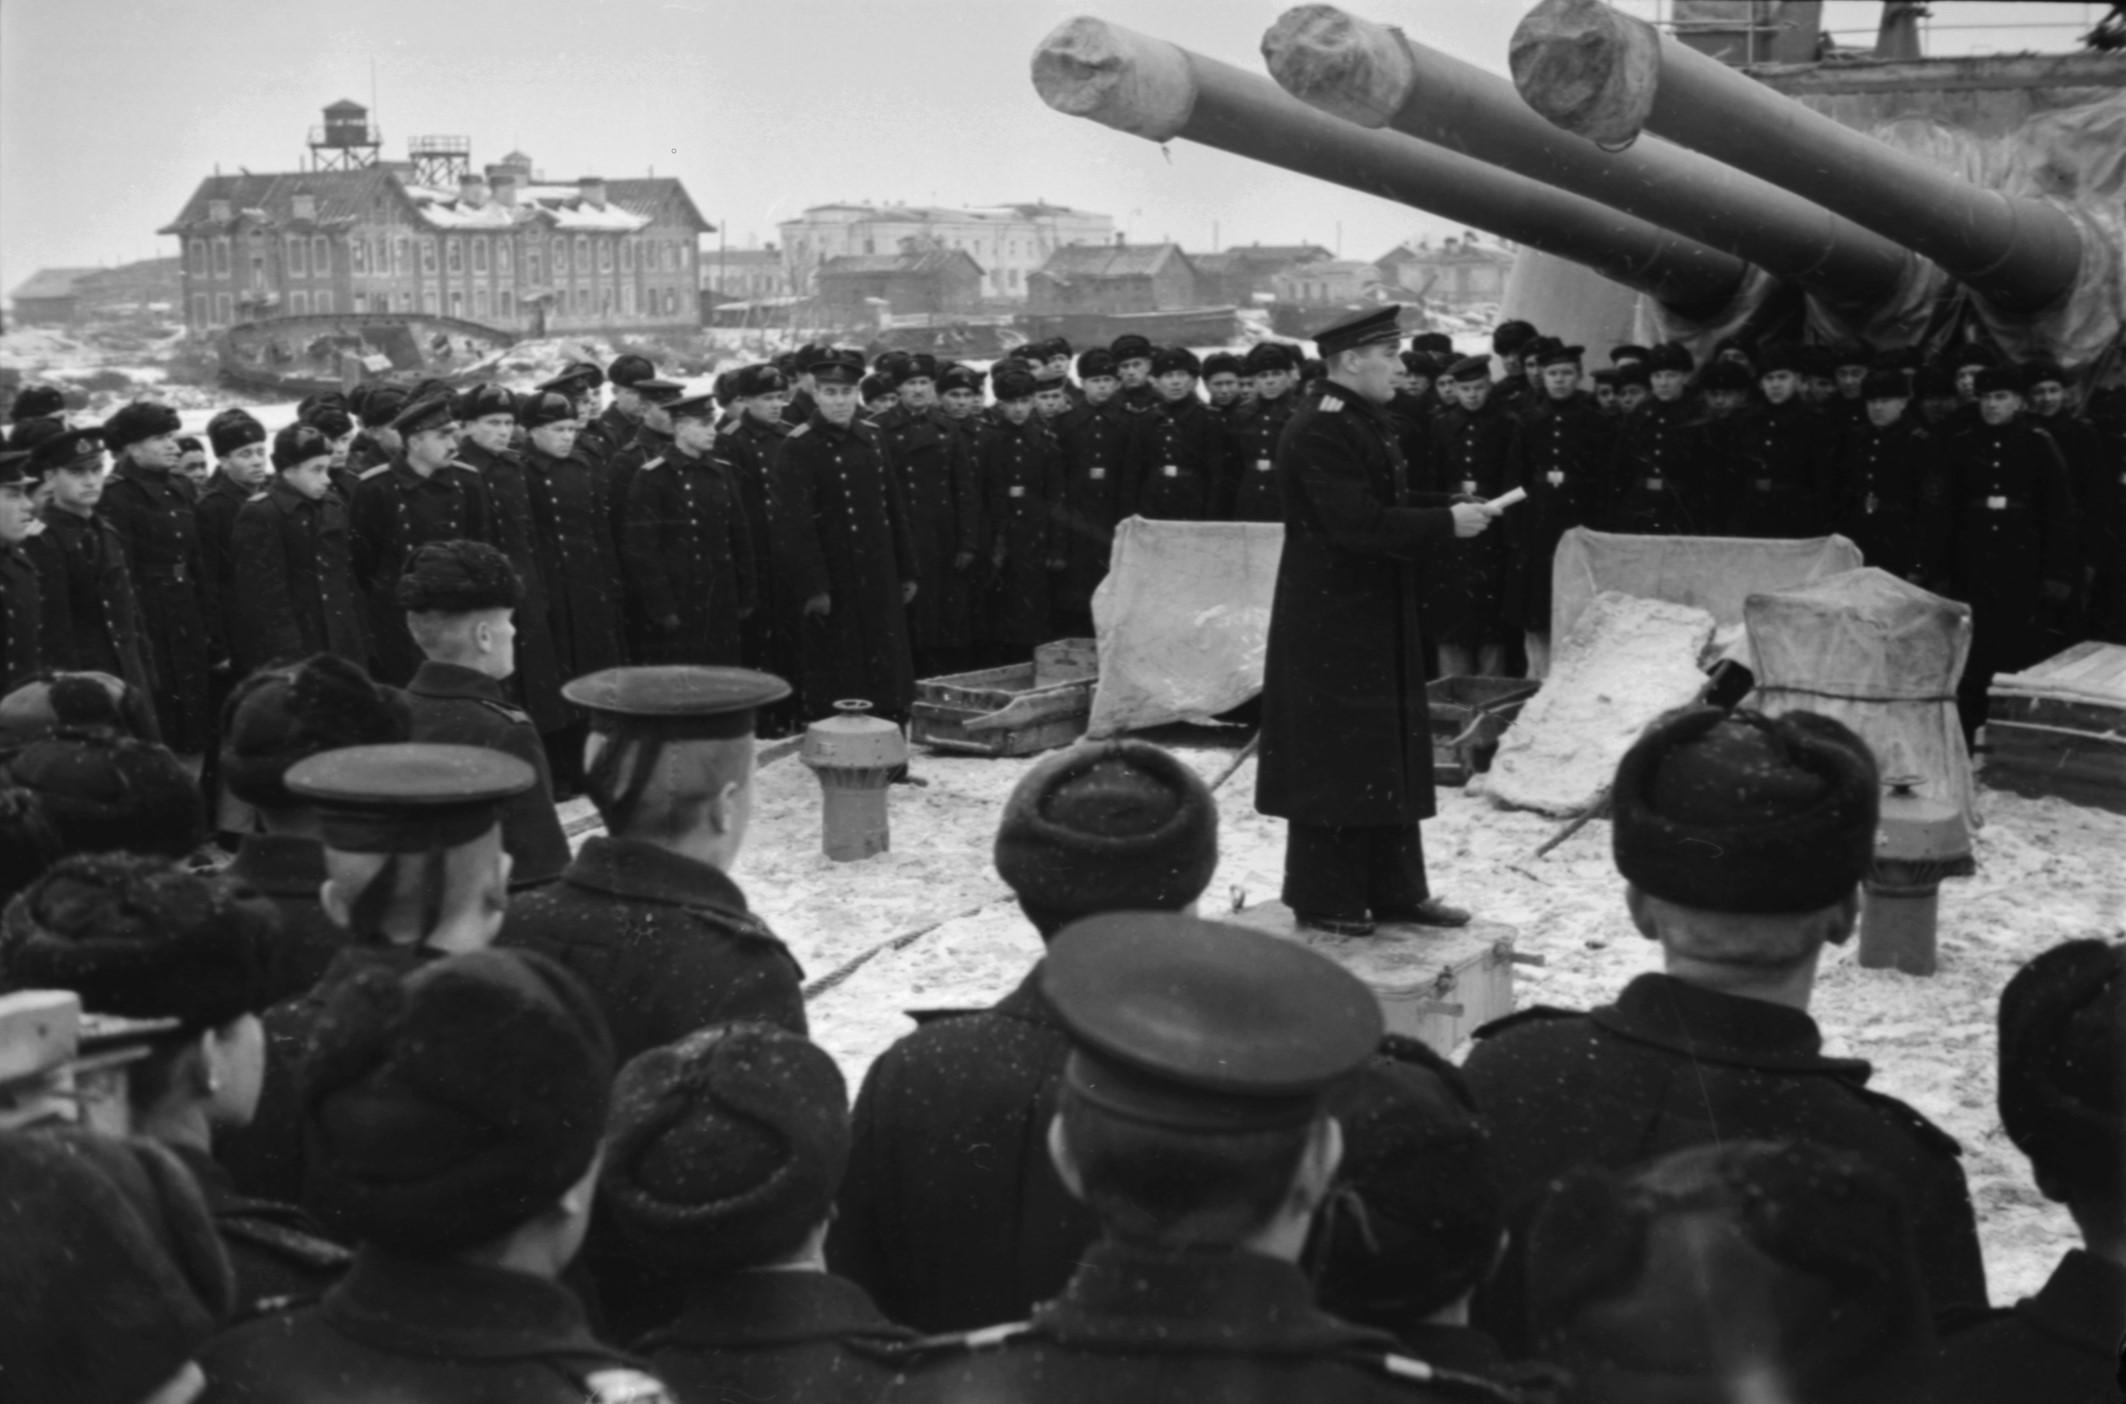 Экипаж слушает приказ командующего Балтийским флотом, 1944